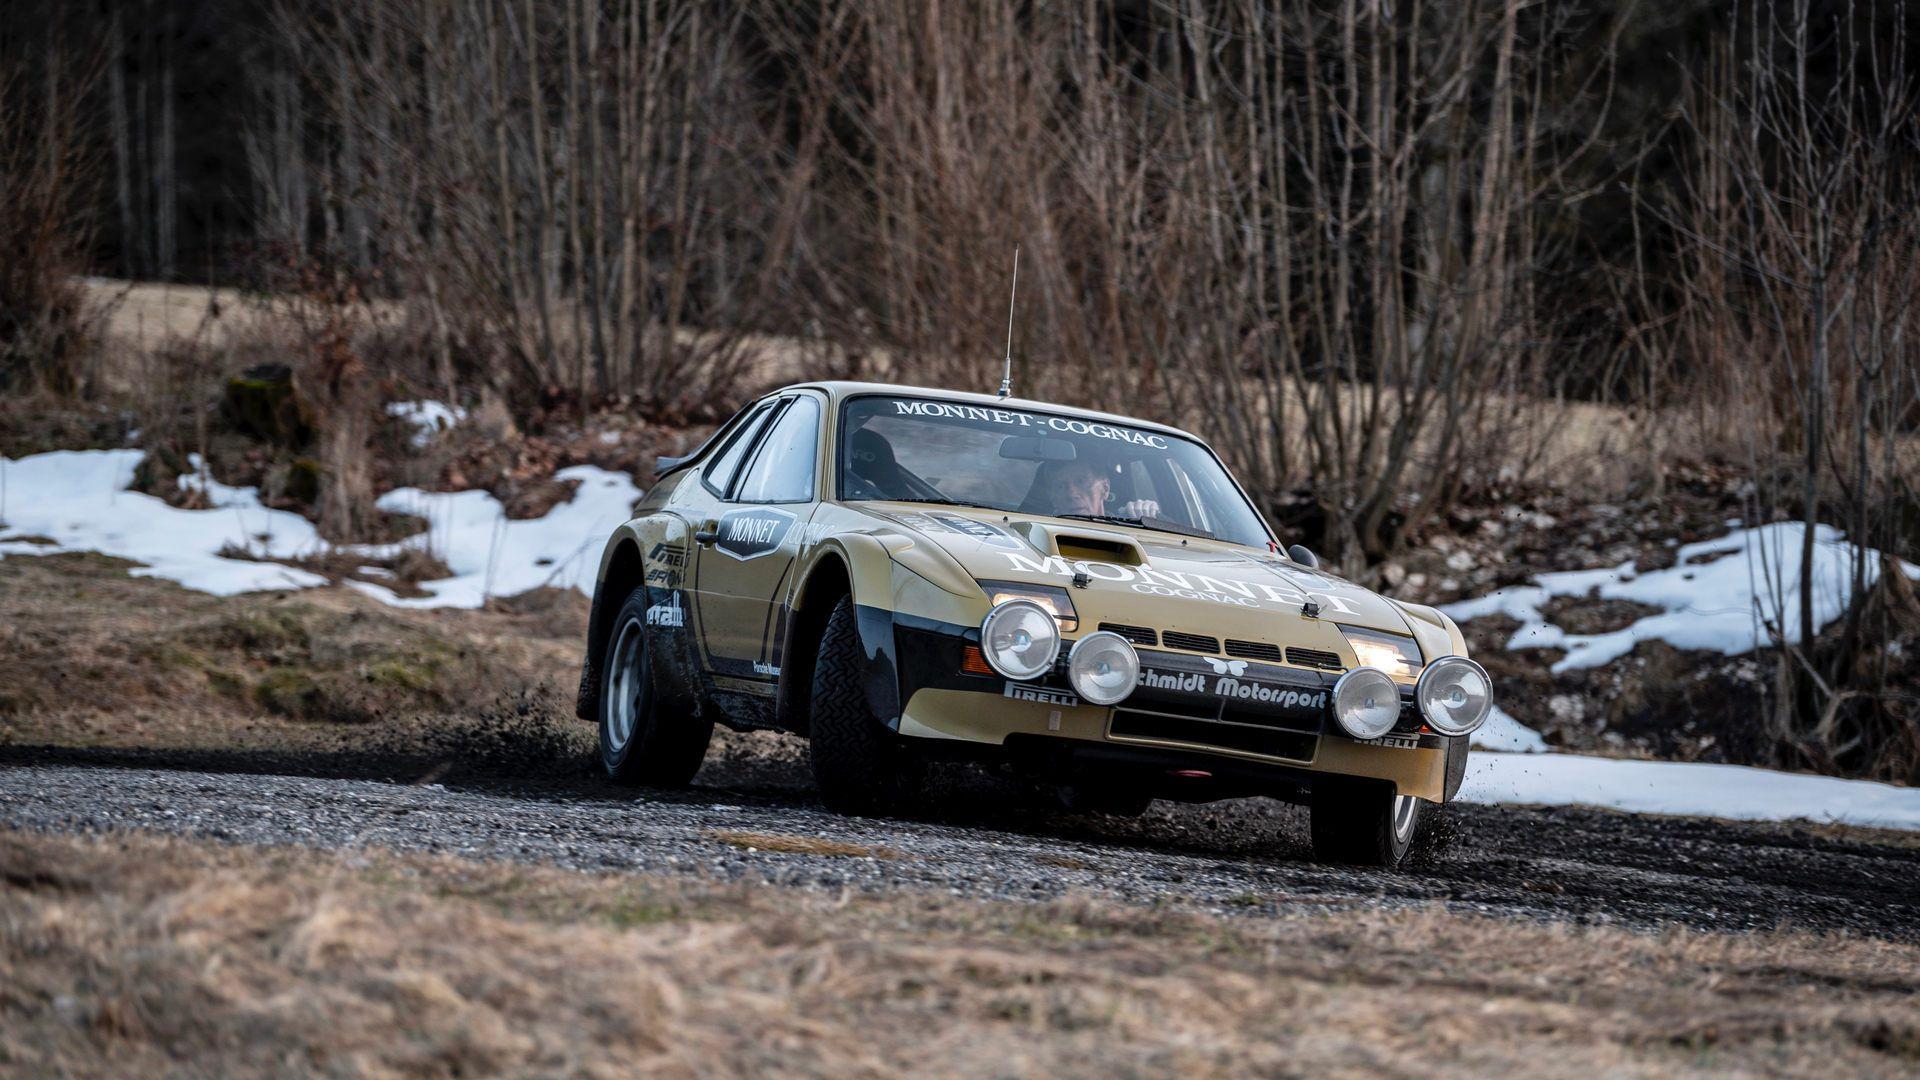 Porsche-924-Carrera-GTS-rally-car-Walter-Rohrl-11